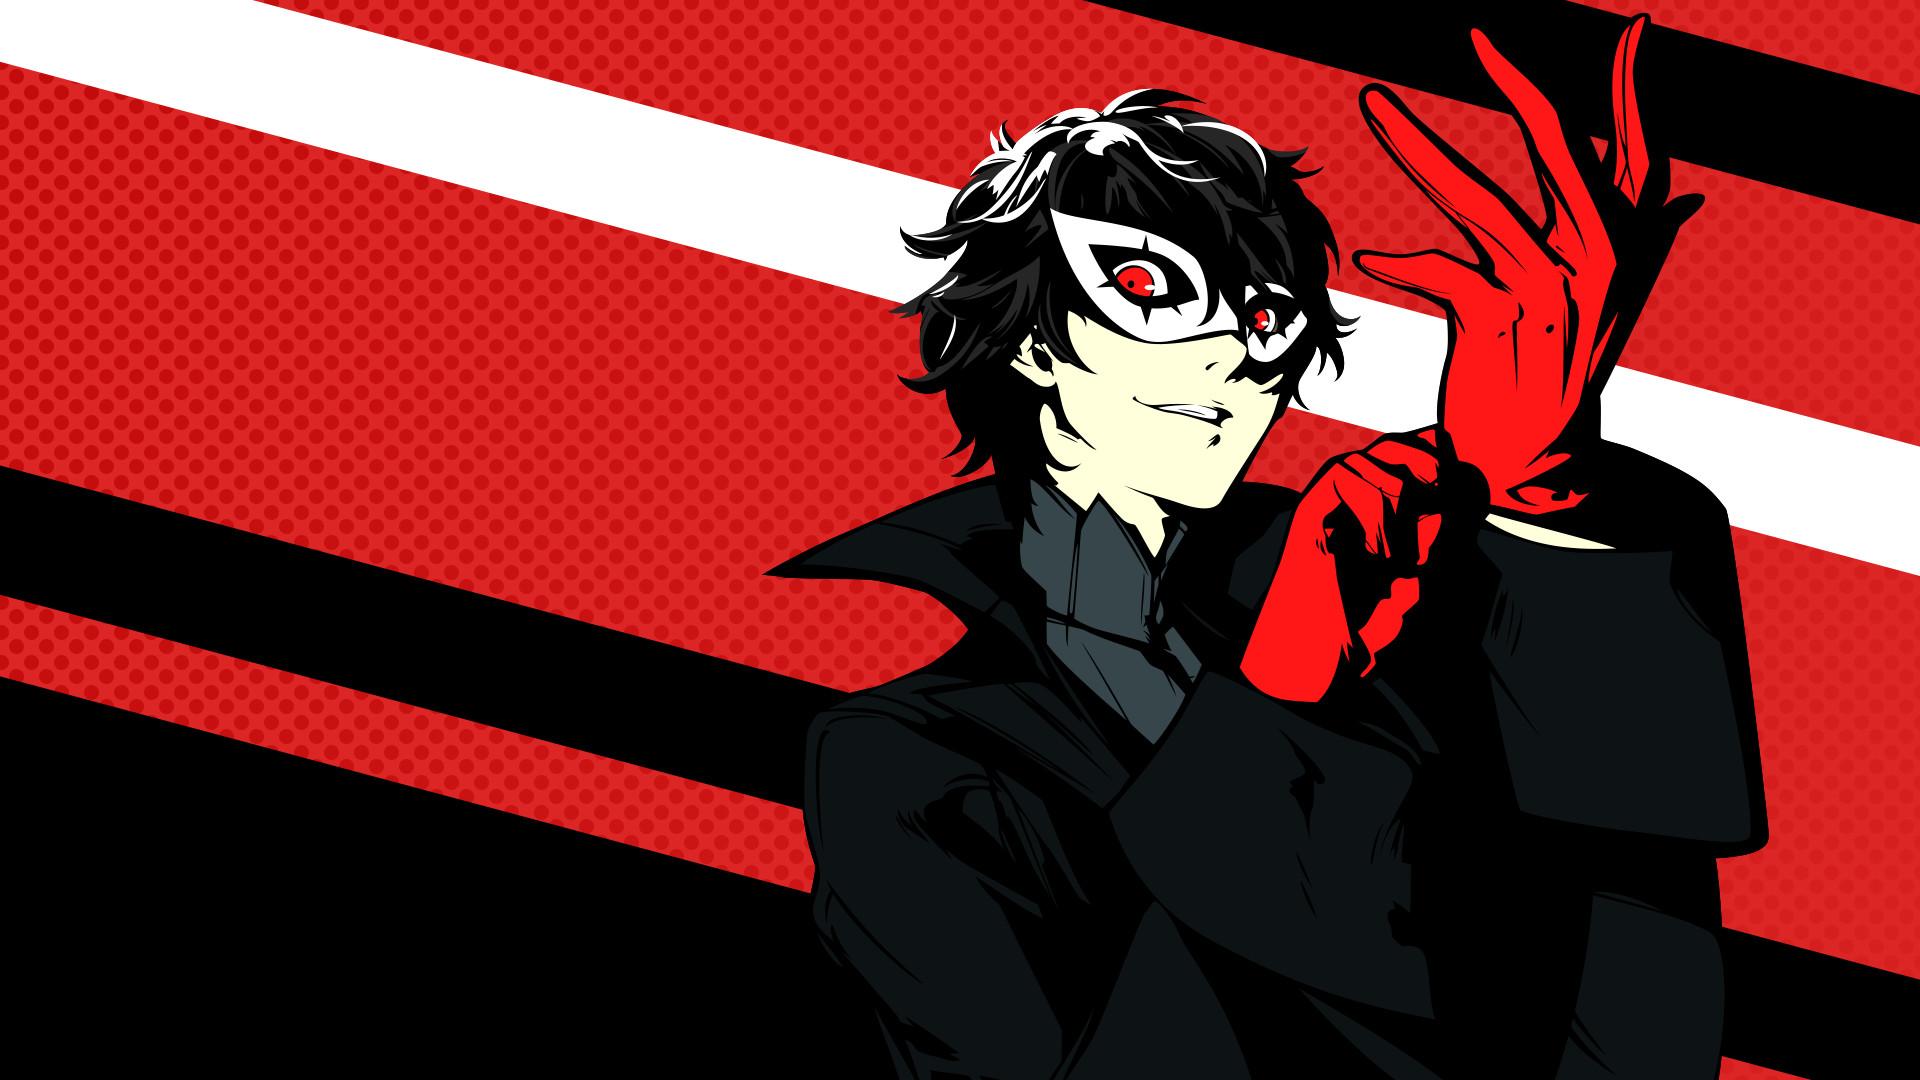 Video Game – Persona 5 Akira Kurusu Bakgrund